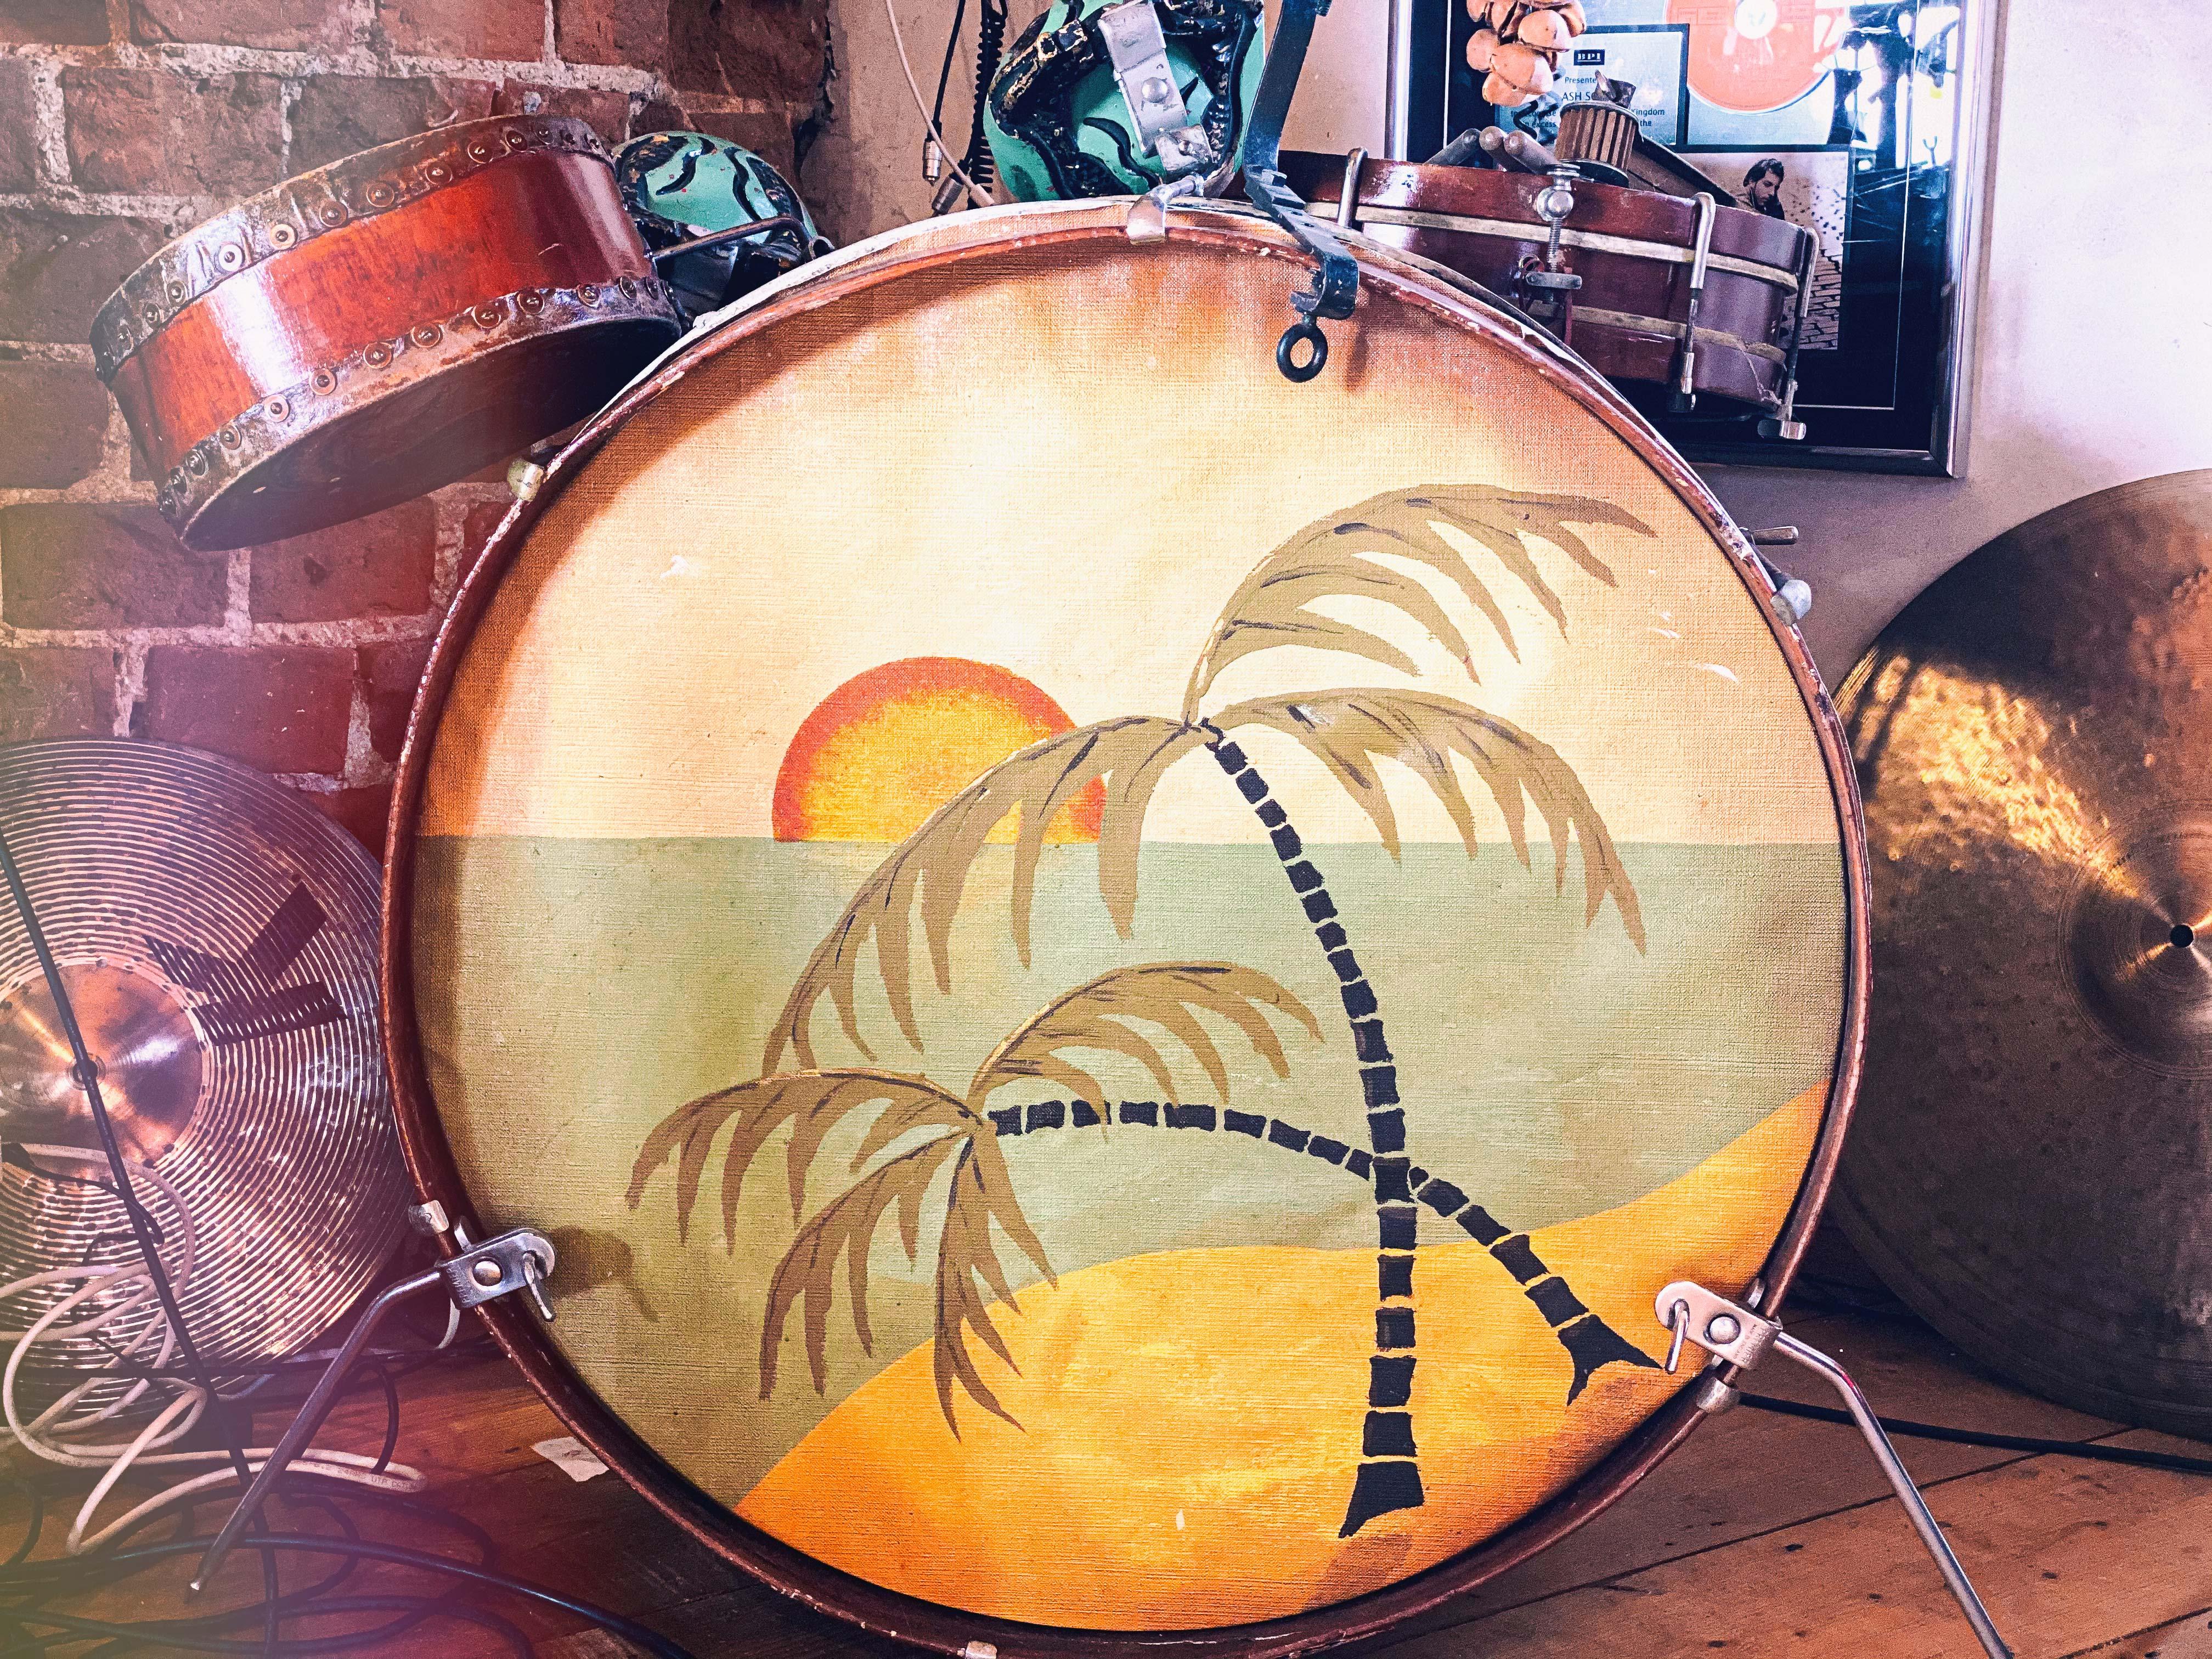 extra-snares-kicks-percussion